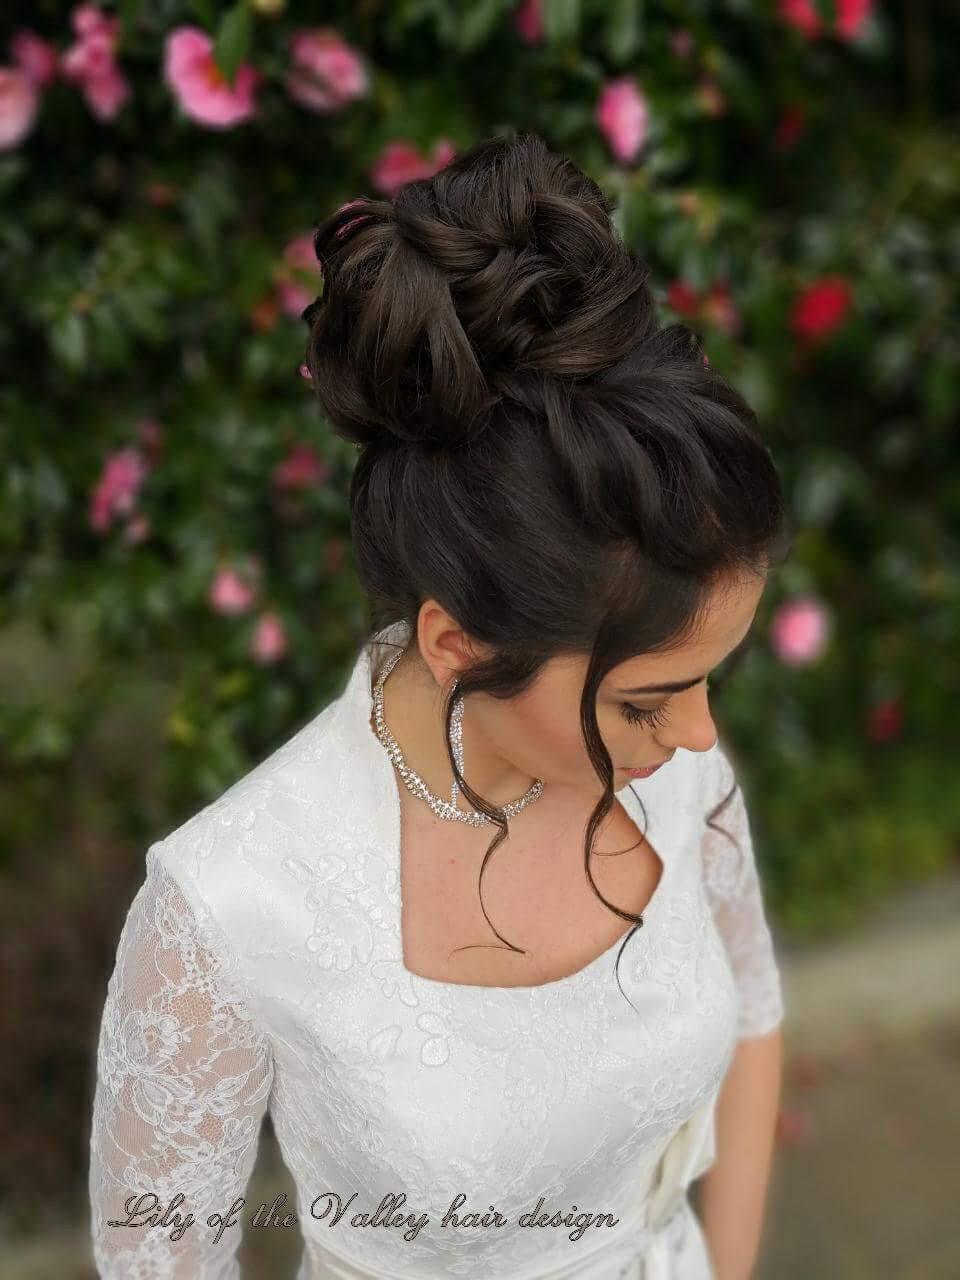 - Make Me Bridal Artist: Lily of the Valley hair design. #classic #bridalhair #updo #elegant #brunette #highbun #bridalhairstylist #vintage #beauty #bride #weddinghair